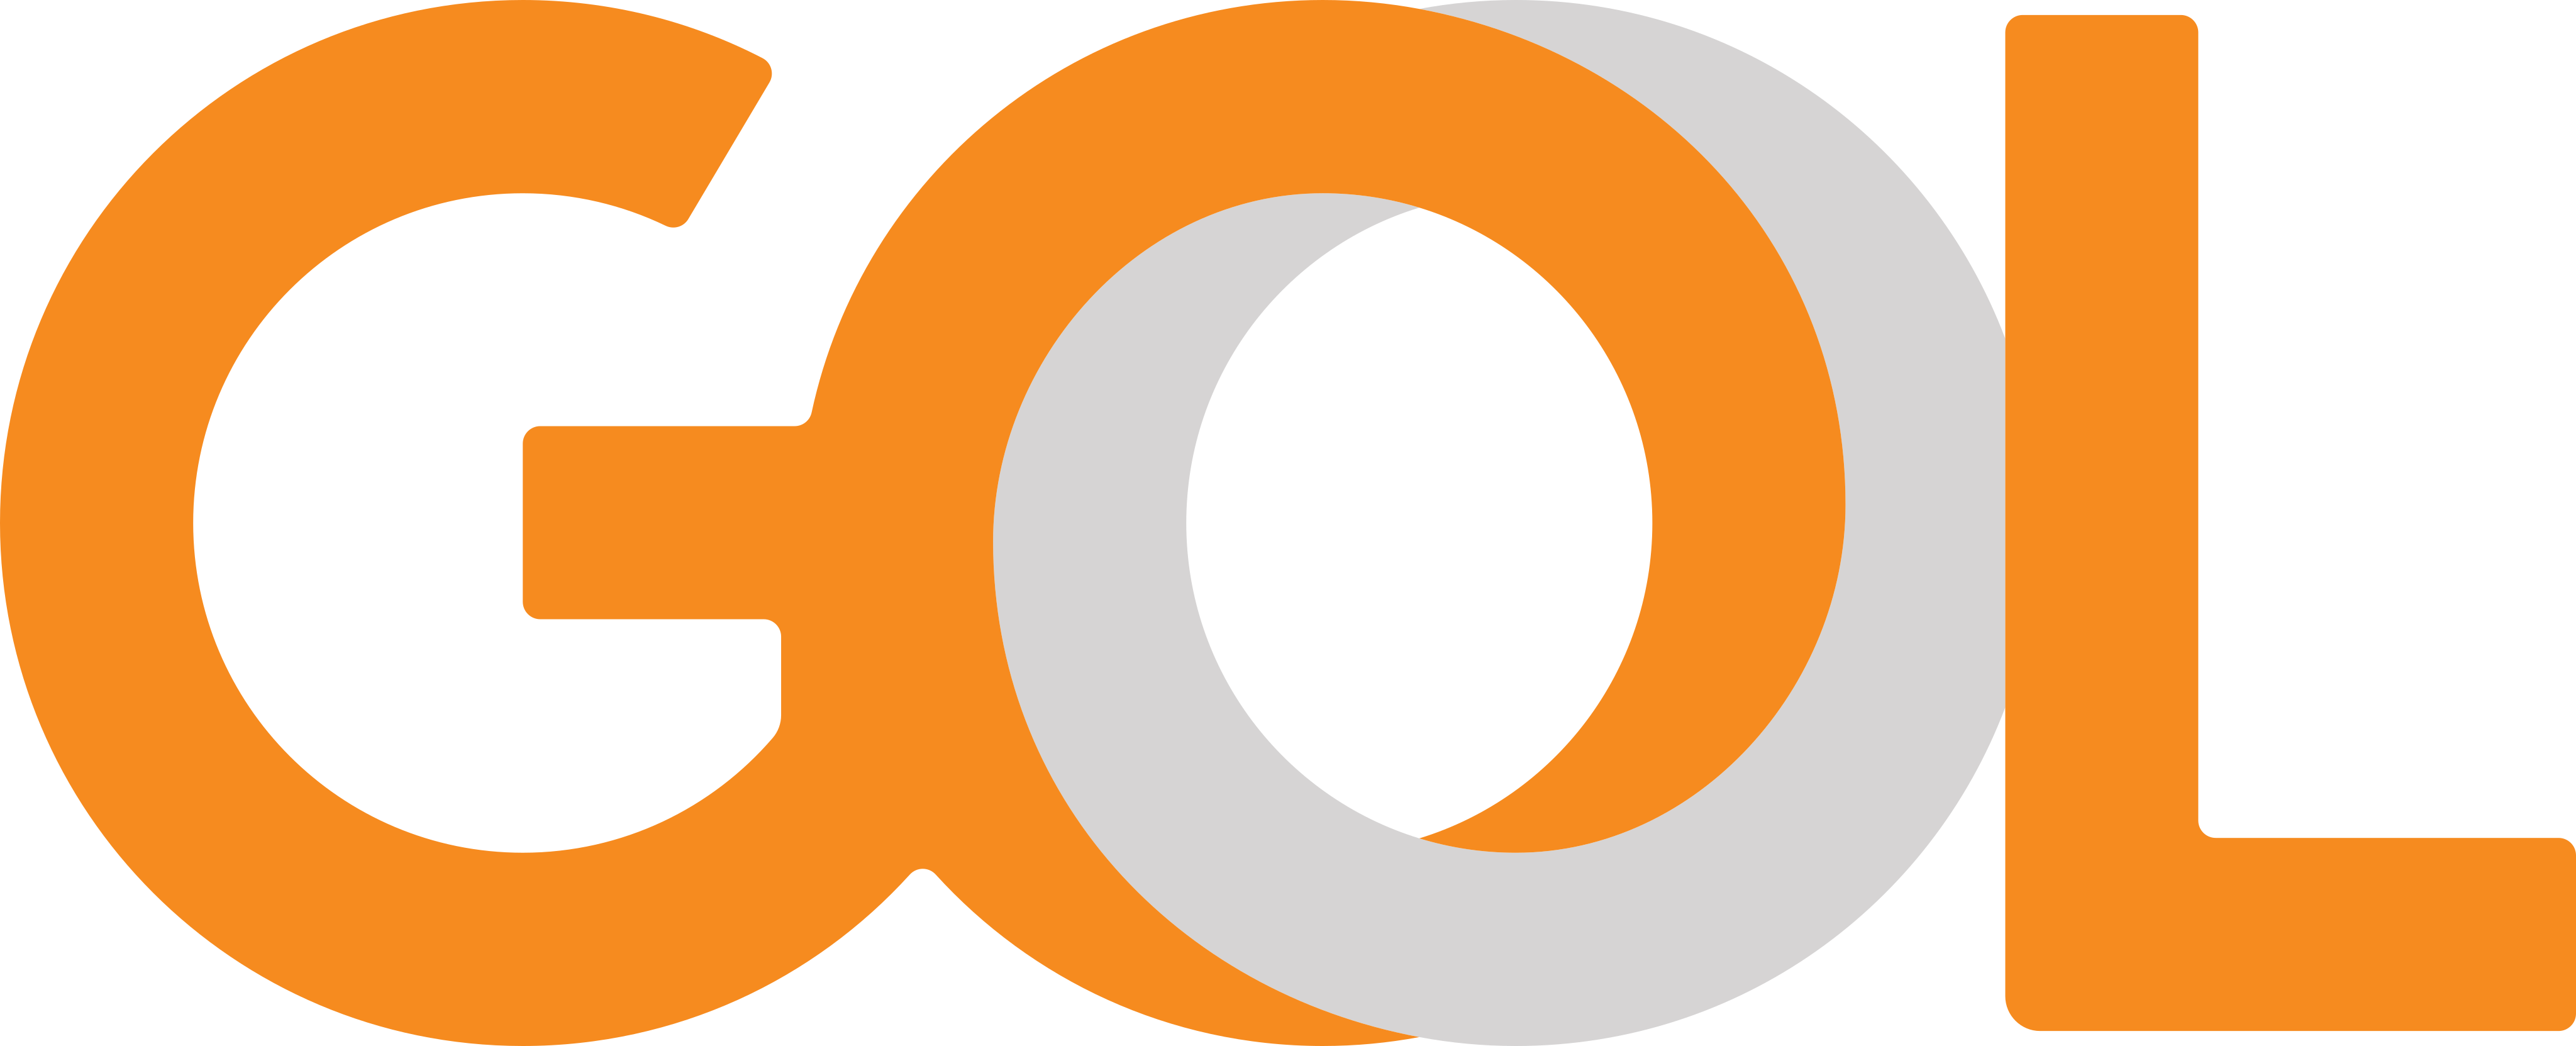 Gol logo.